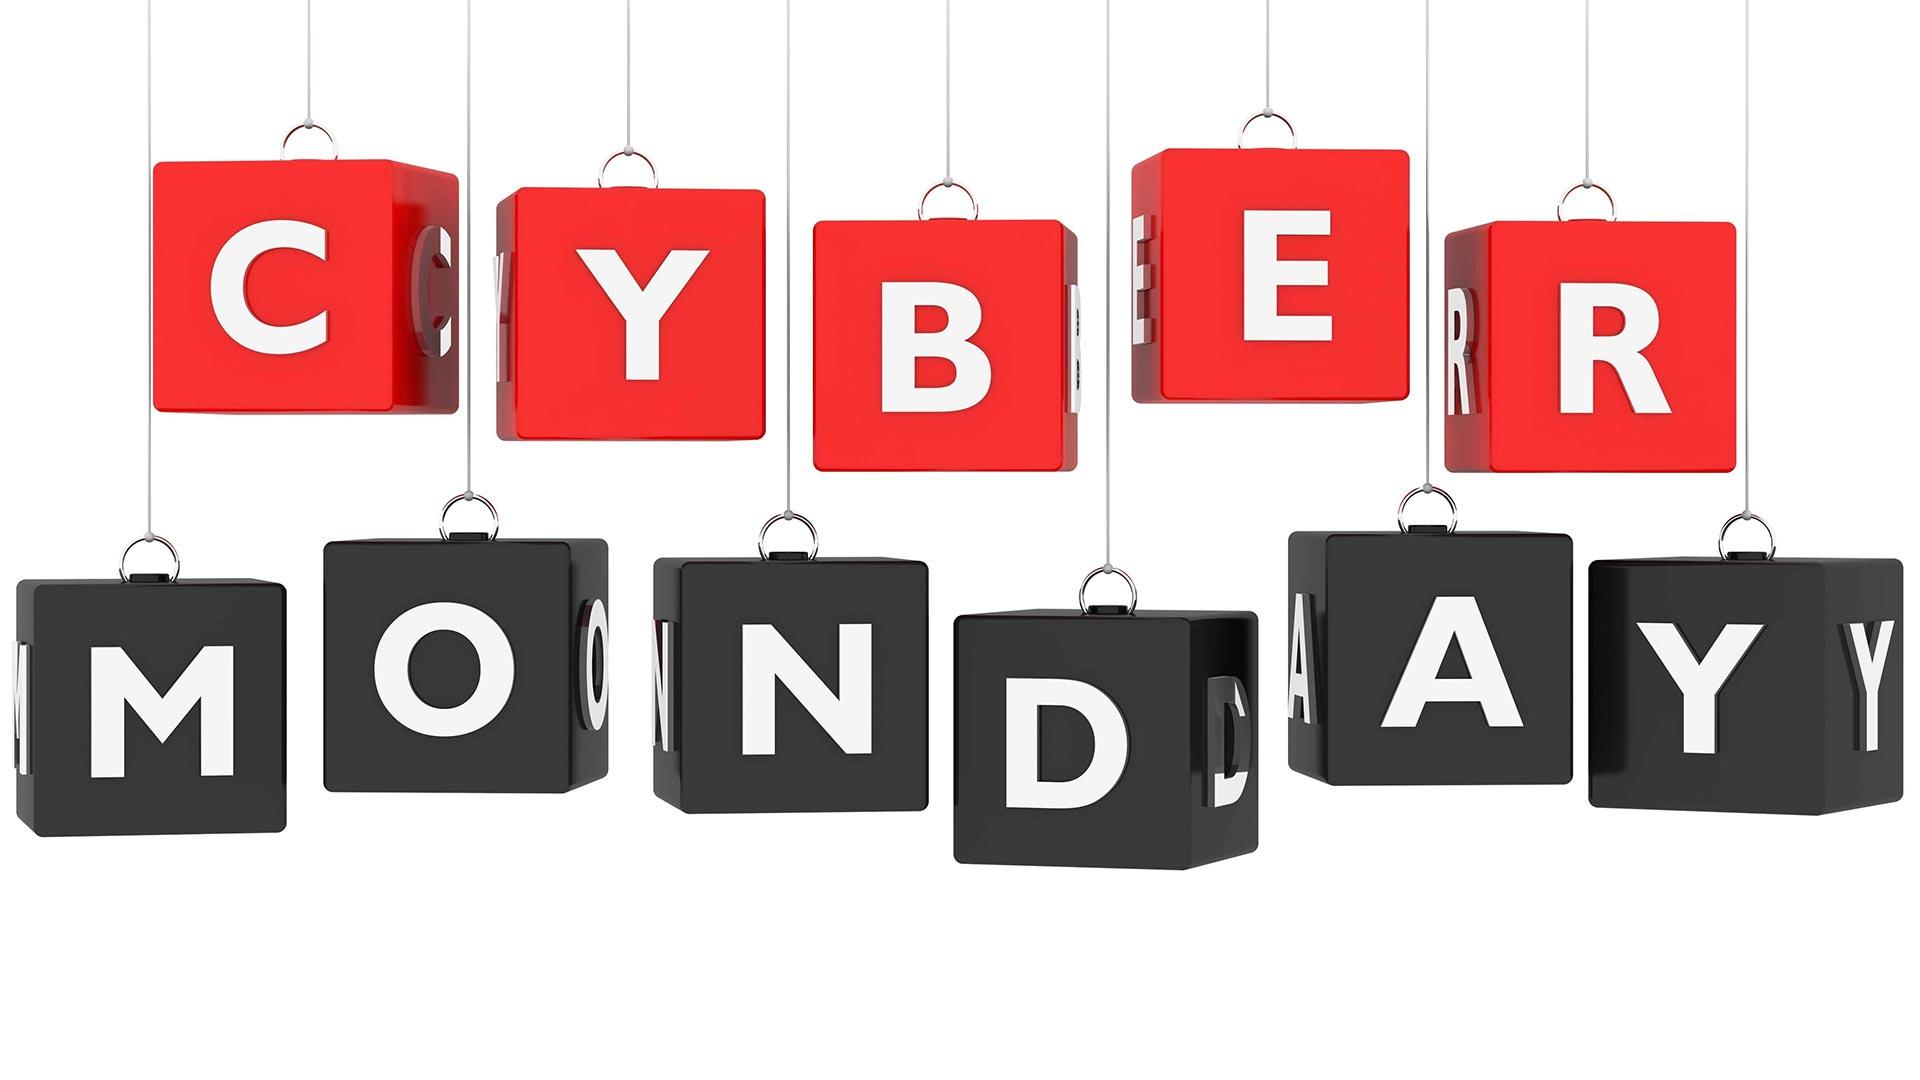 Cyber Monday  online εκπτώσεις μόνο για σήμερα 28 11 2016! - Eshoped 69067379379